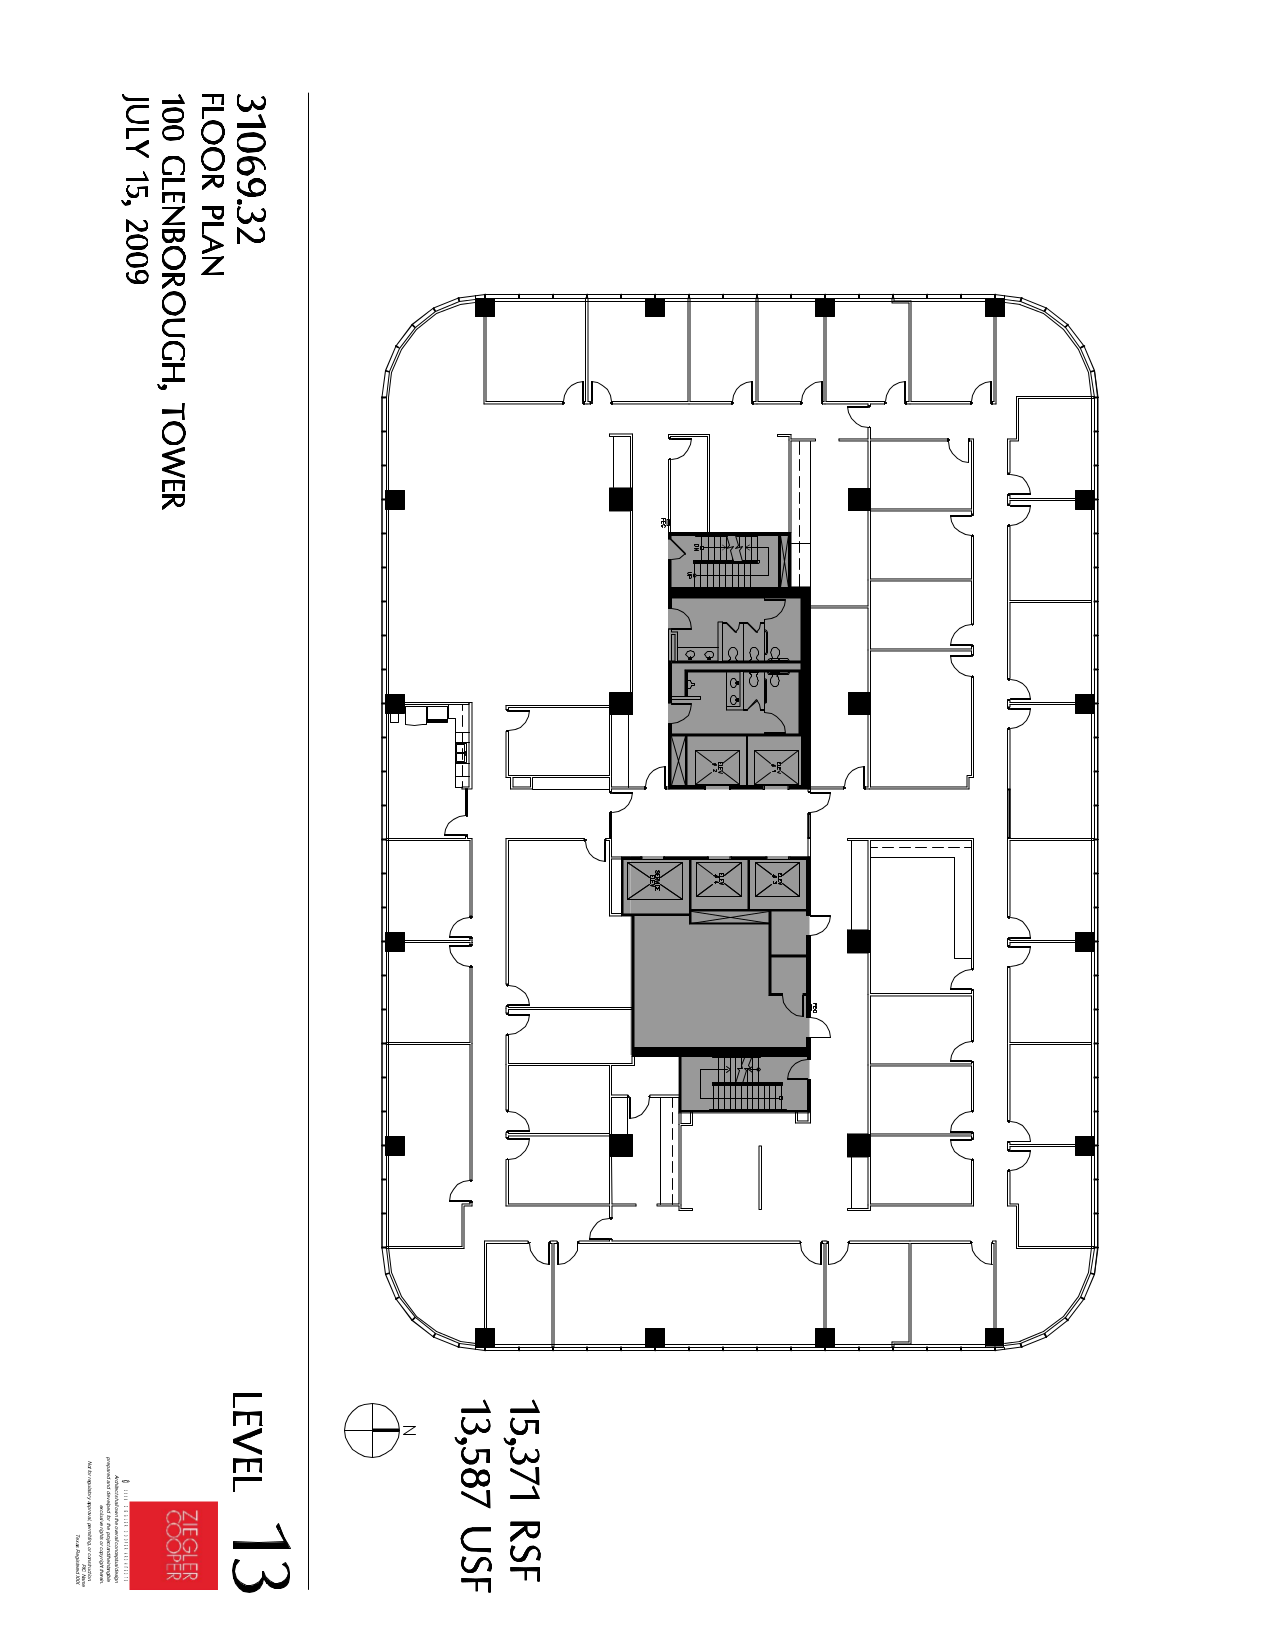 Northborough tower 100 glenborough dr 13th floor unit for 100 floors floor 13